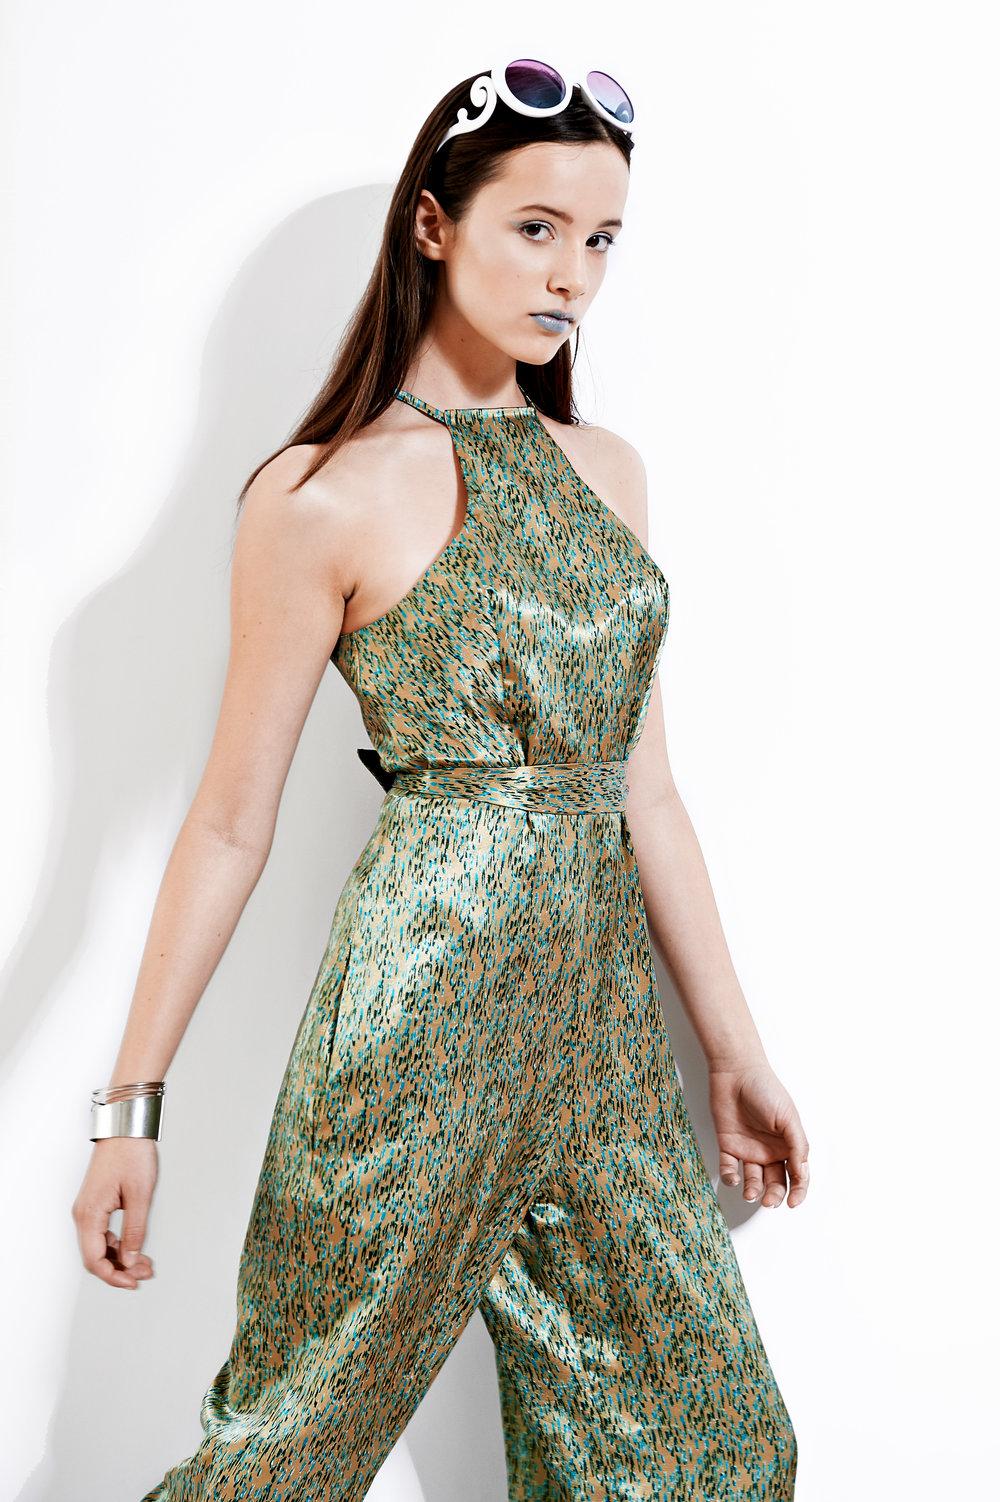 Marta-Hewson-Alexina-Charbonneau-Model-Shoot-16270.jpg